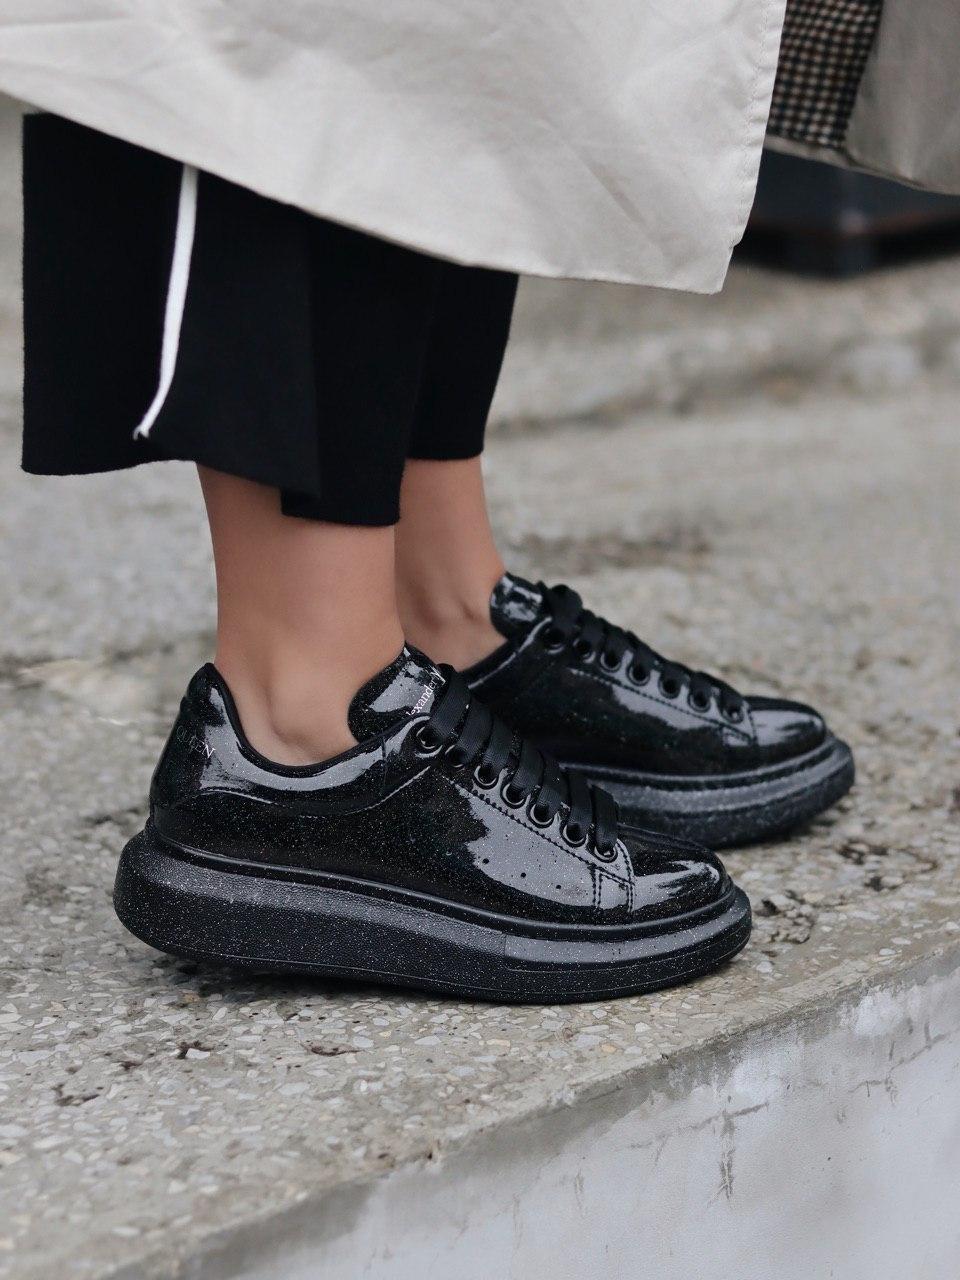 Стильні кросівки Alexander McQueen (Олександр Маквин) Black Space LUX QUALITY